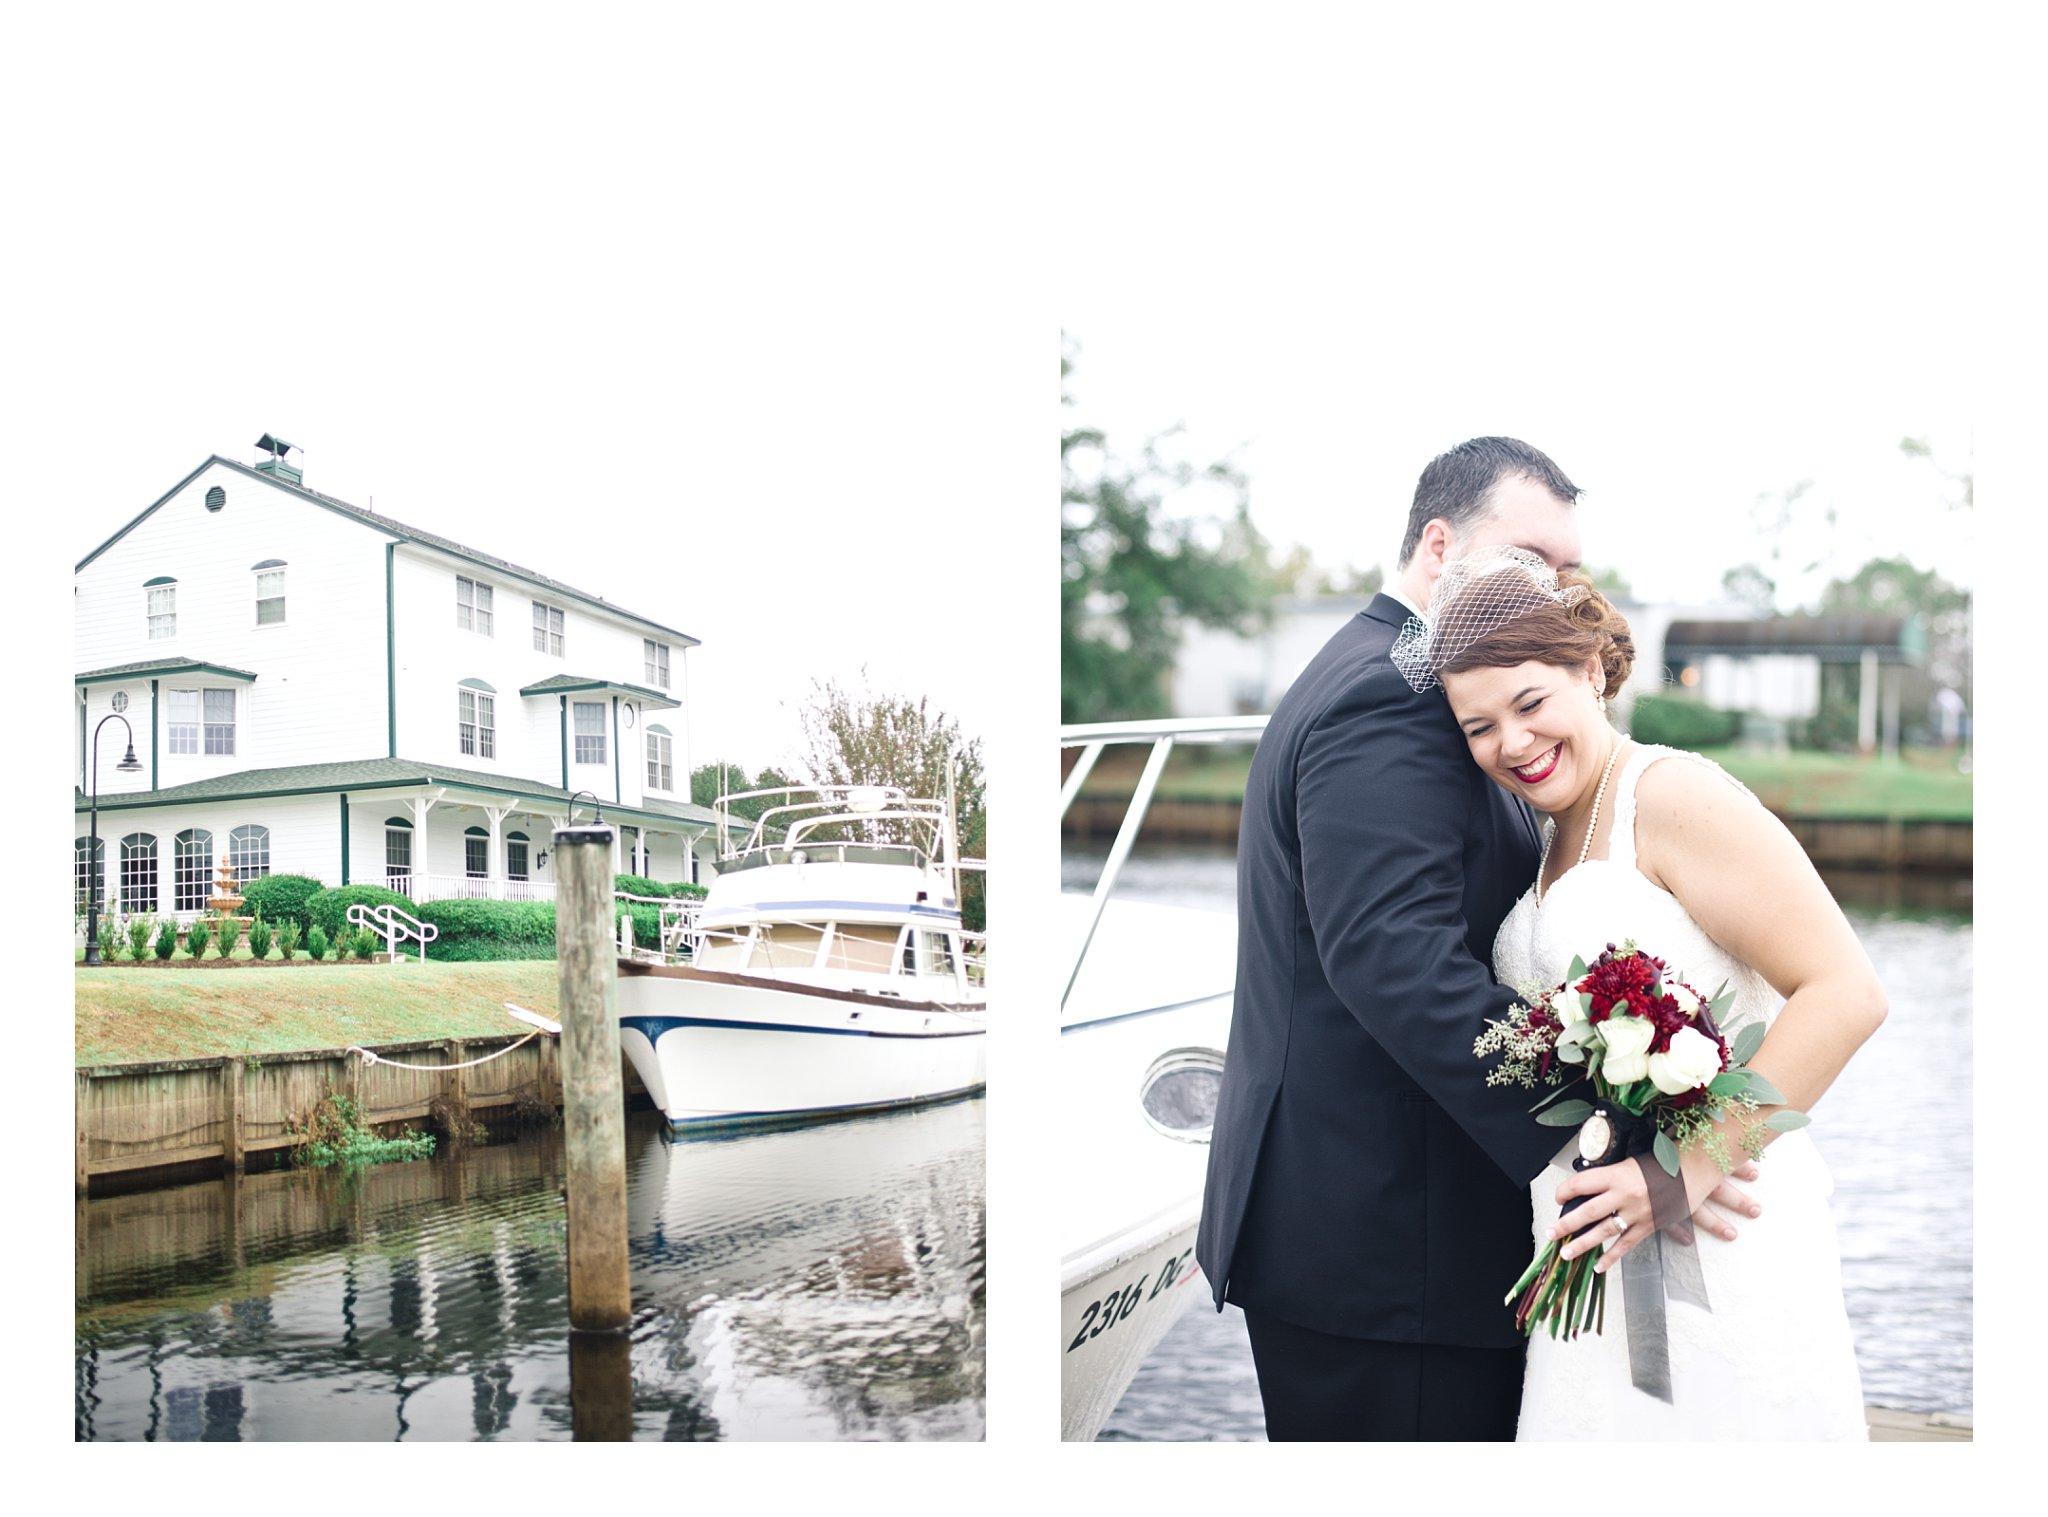 cypress-inn-garnet-black-lowcountry-vintage-wedding-conway-sc-photos_0119.jpg